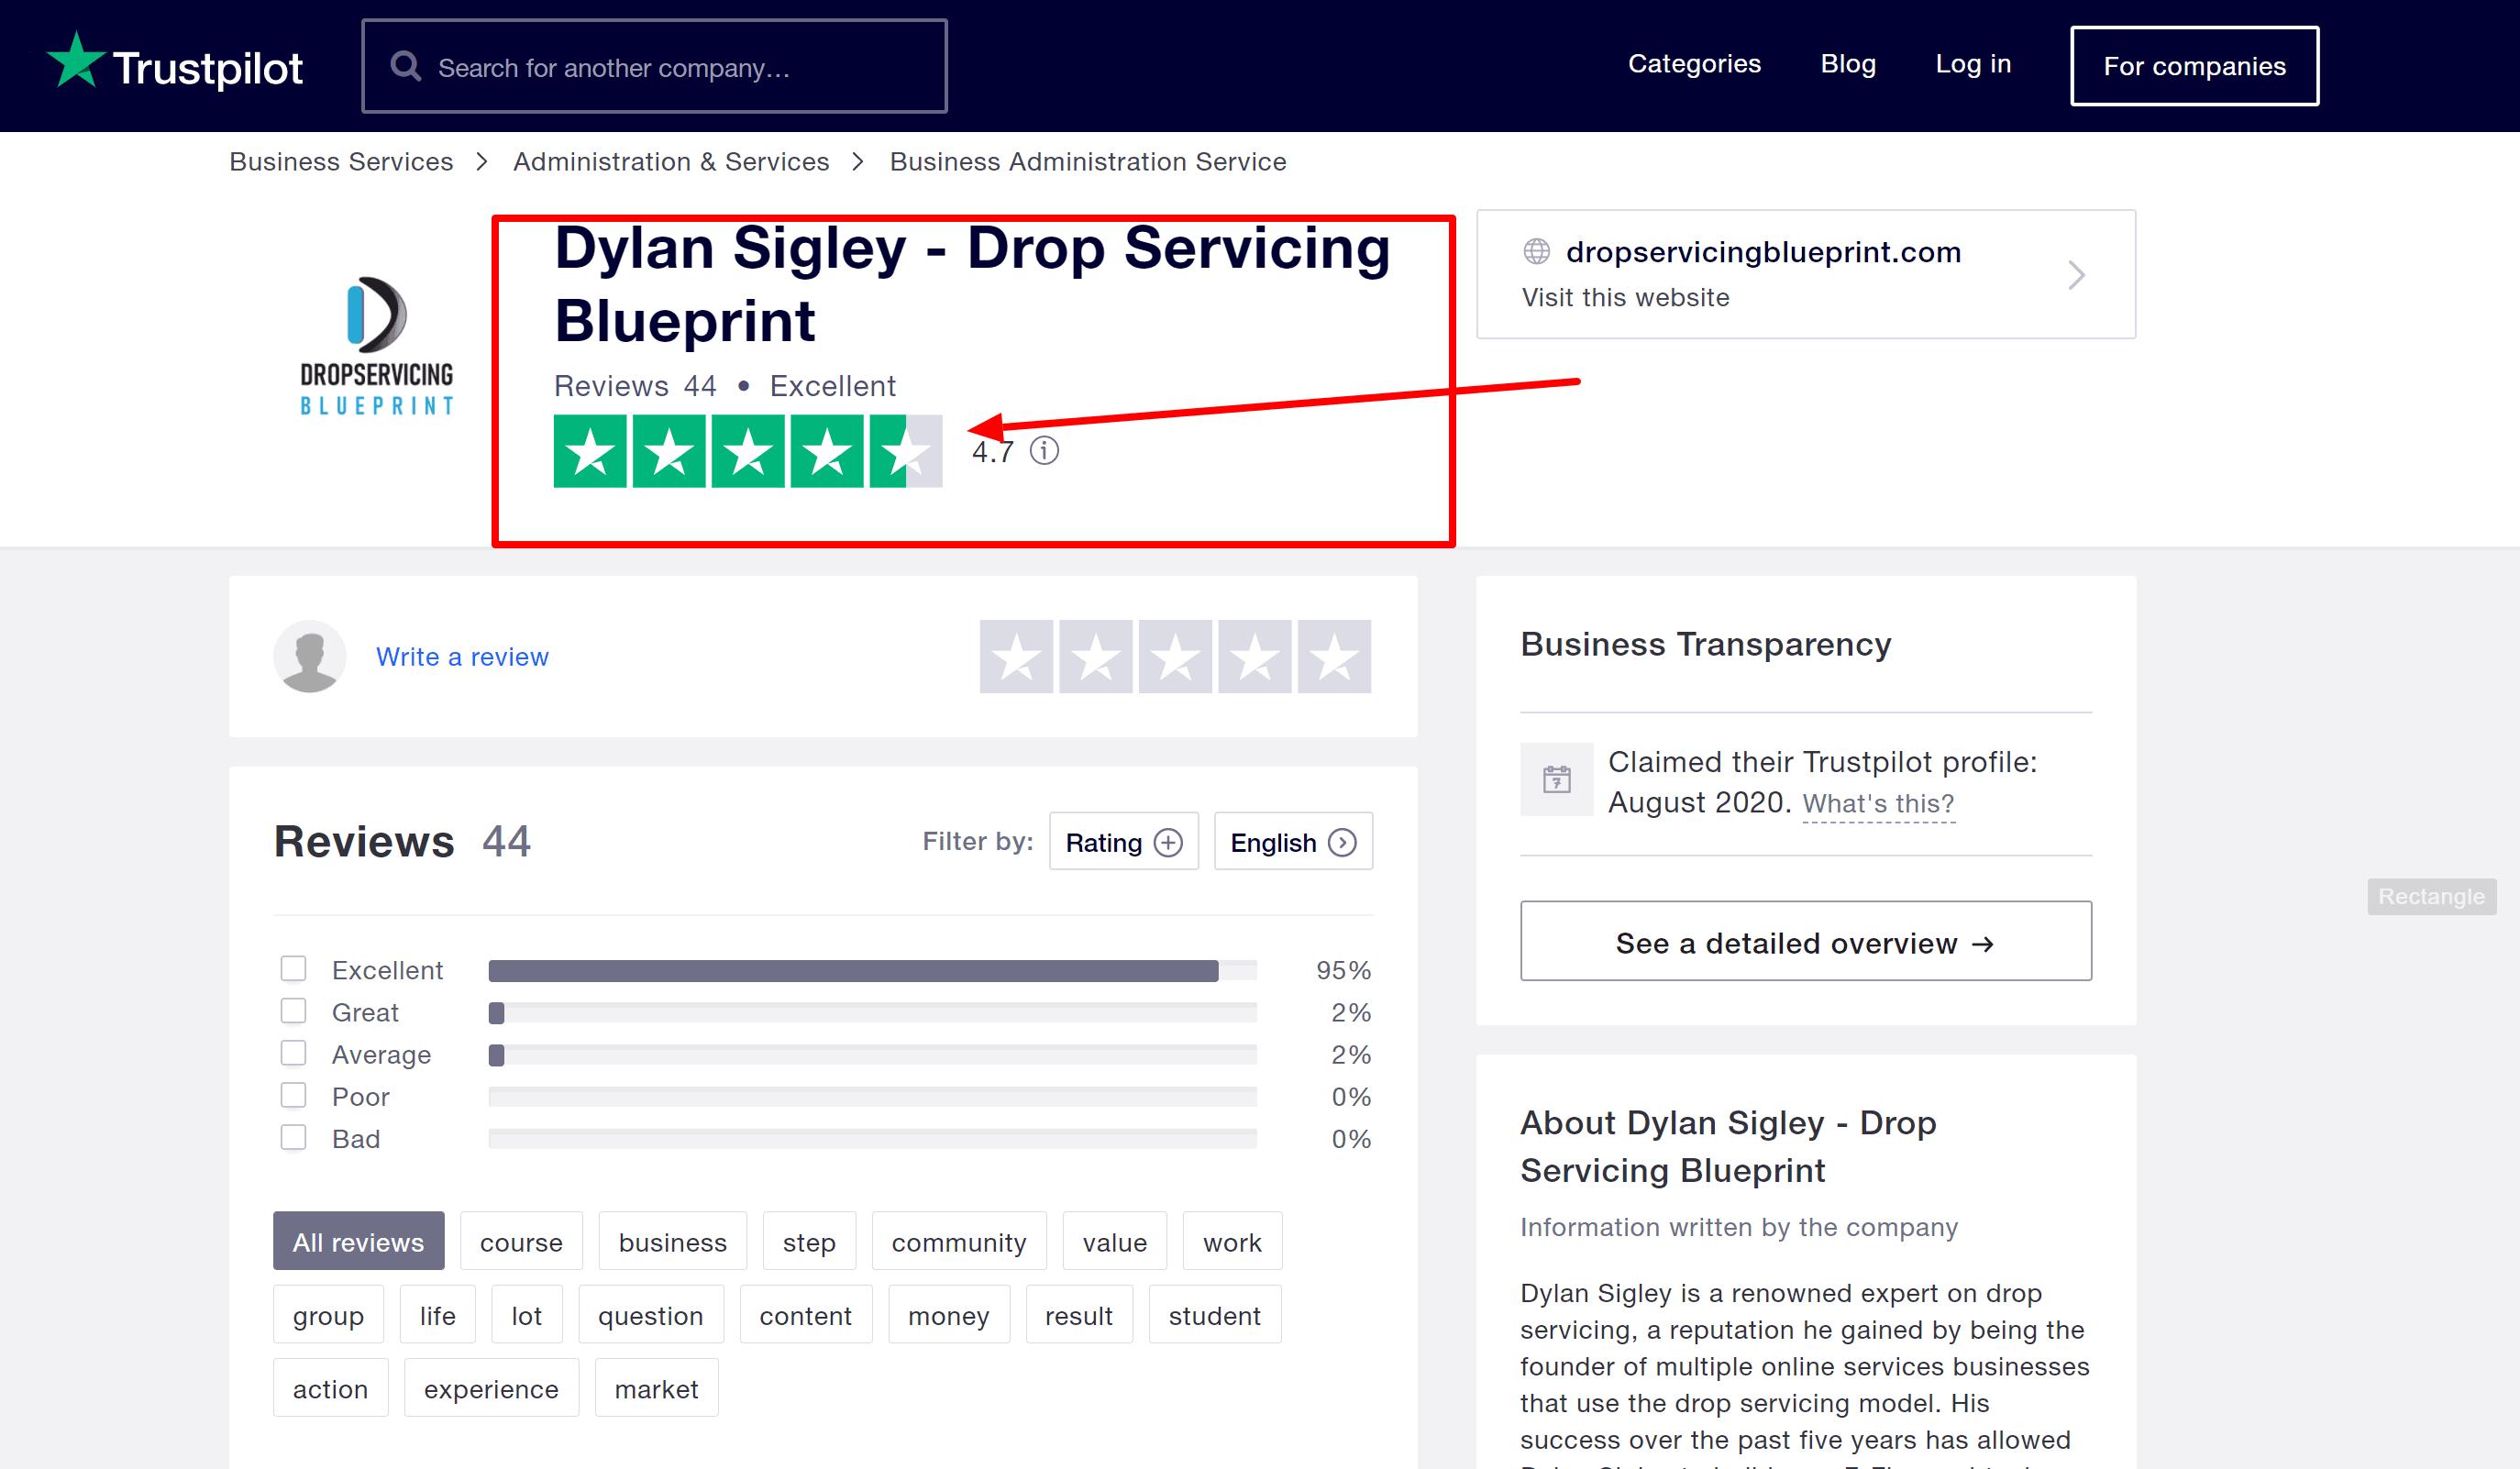 Dylan Sigley - Drop Servicing Blueprint Reviews Read Customer Service